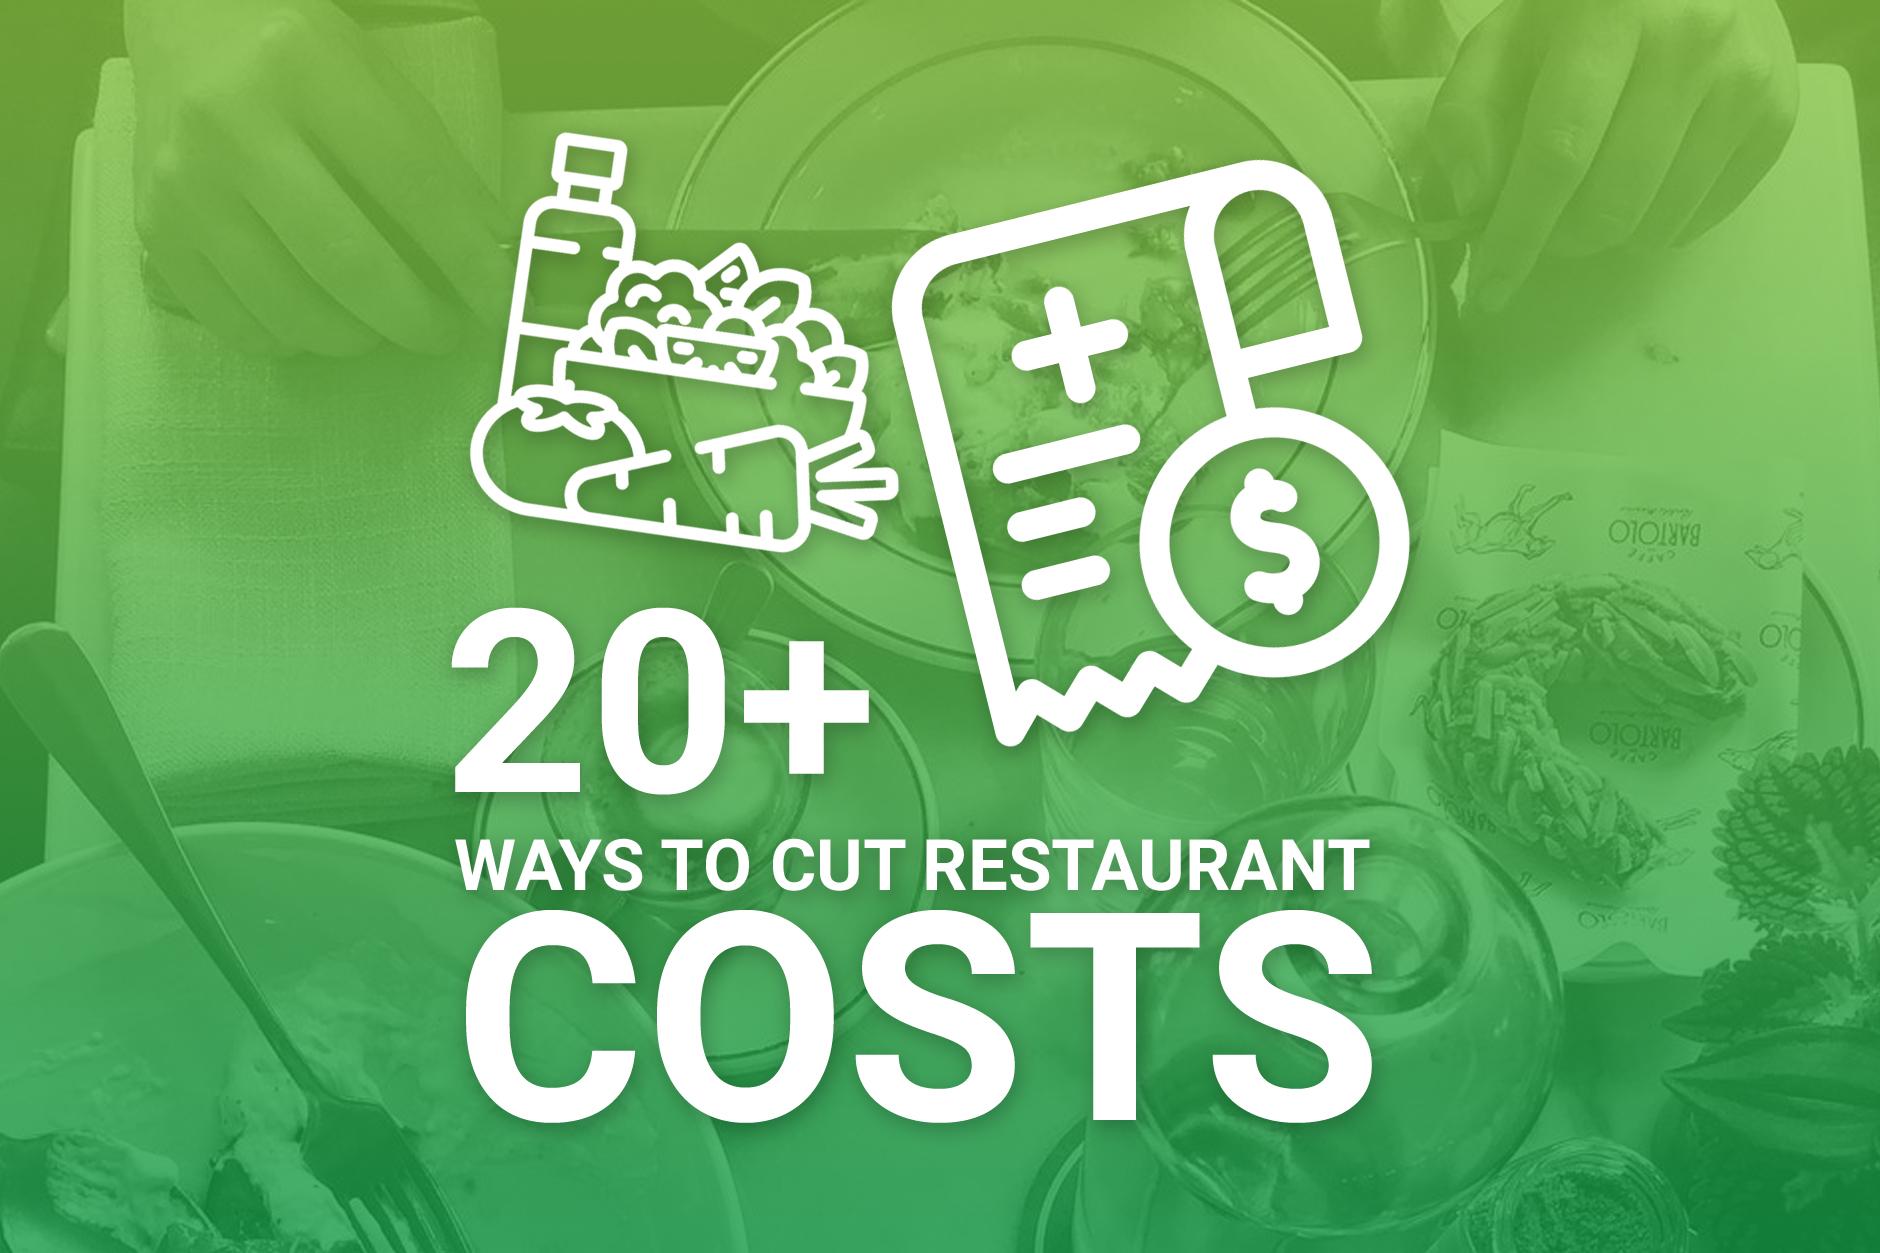 Restaurant Cost Cutting Ideas